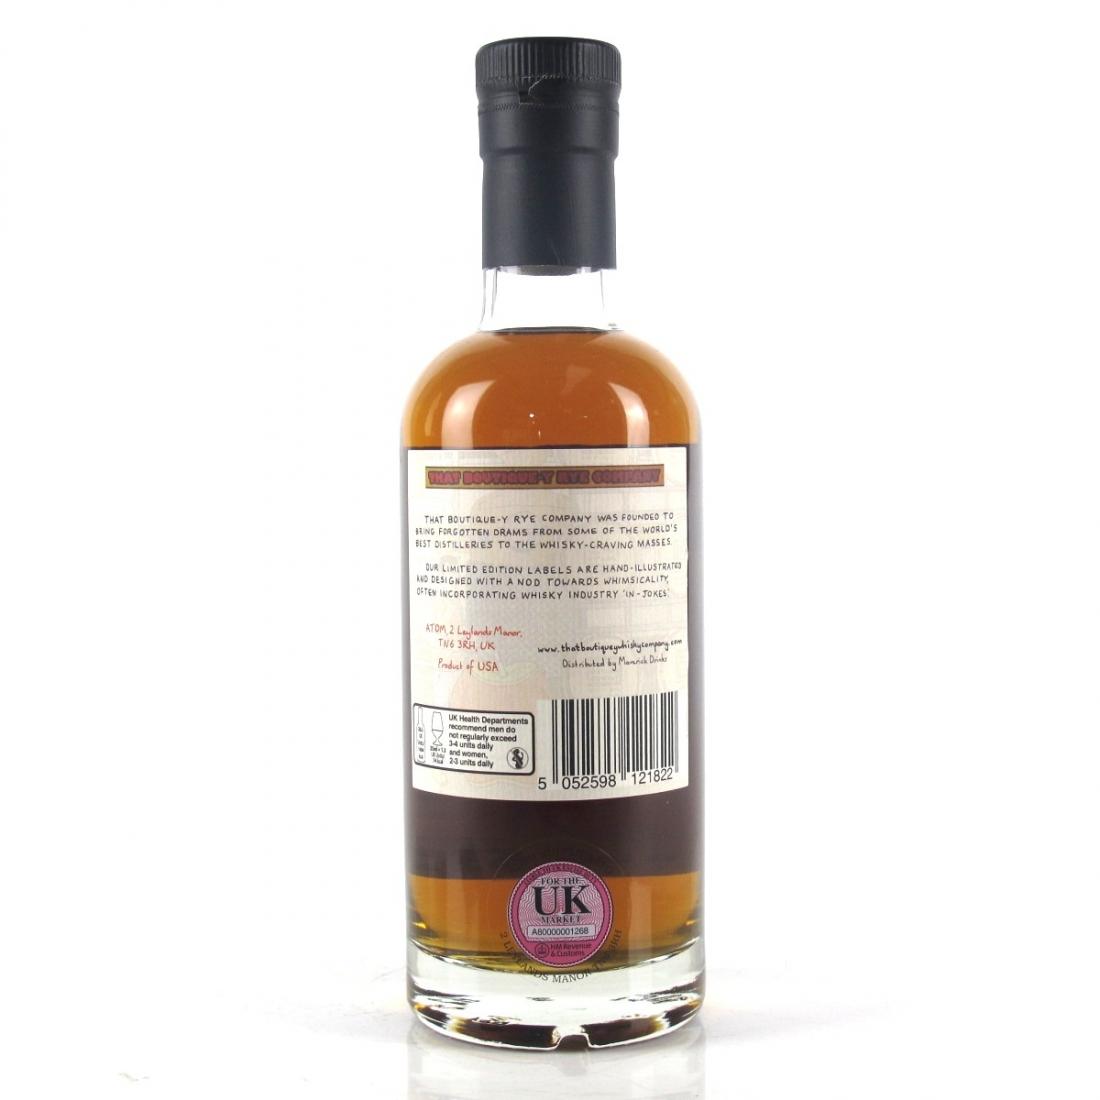 New York Distilling Co That Boutique-y Rye Company 2 Year Old Batch #1